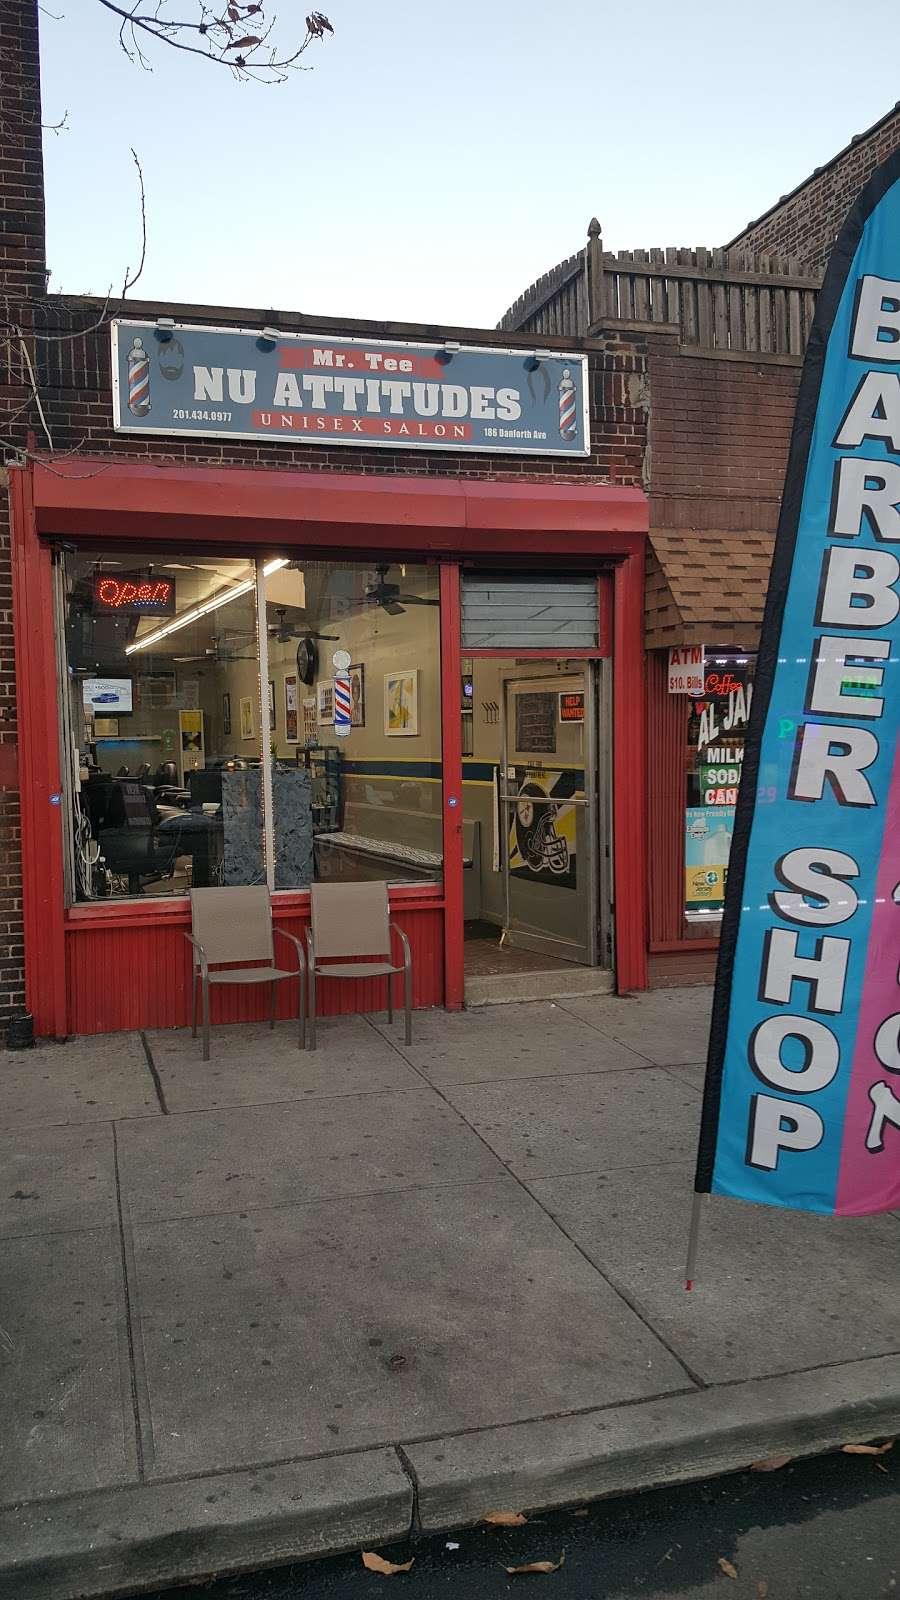 NU ATTITUDES UNISEX SALON - hair care  | Photo 2 of 10 | Address: 186 Danforth Ave, Jersey City, NJ 07305, USA | Phone: (201) 434-0977